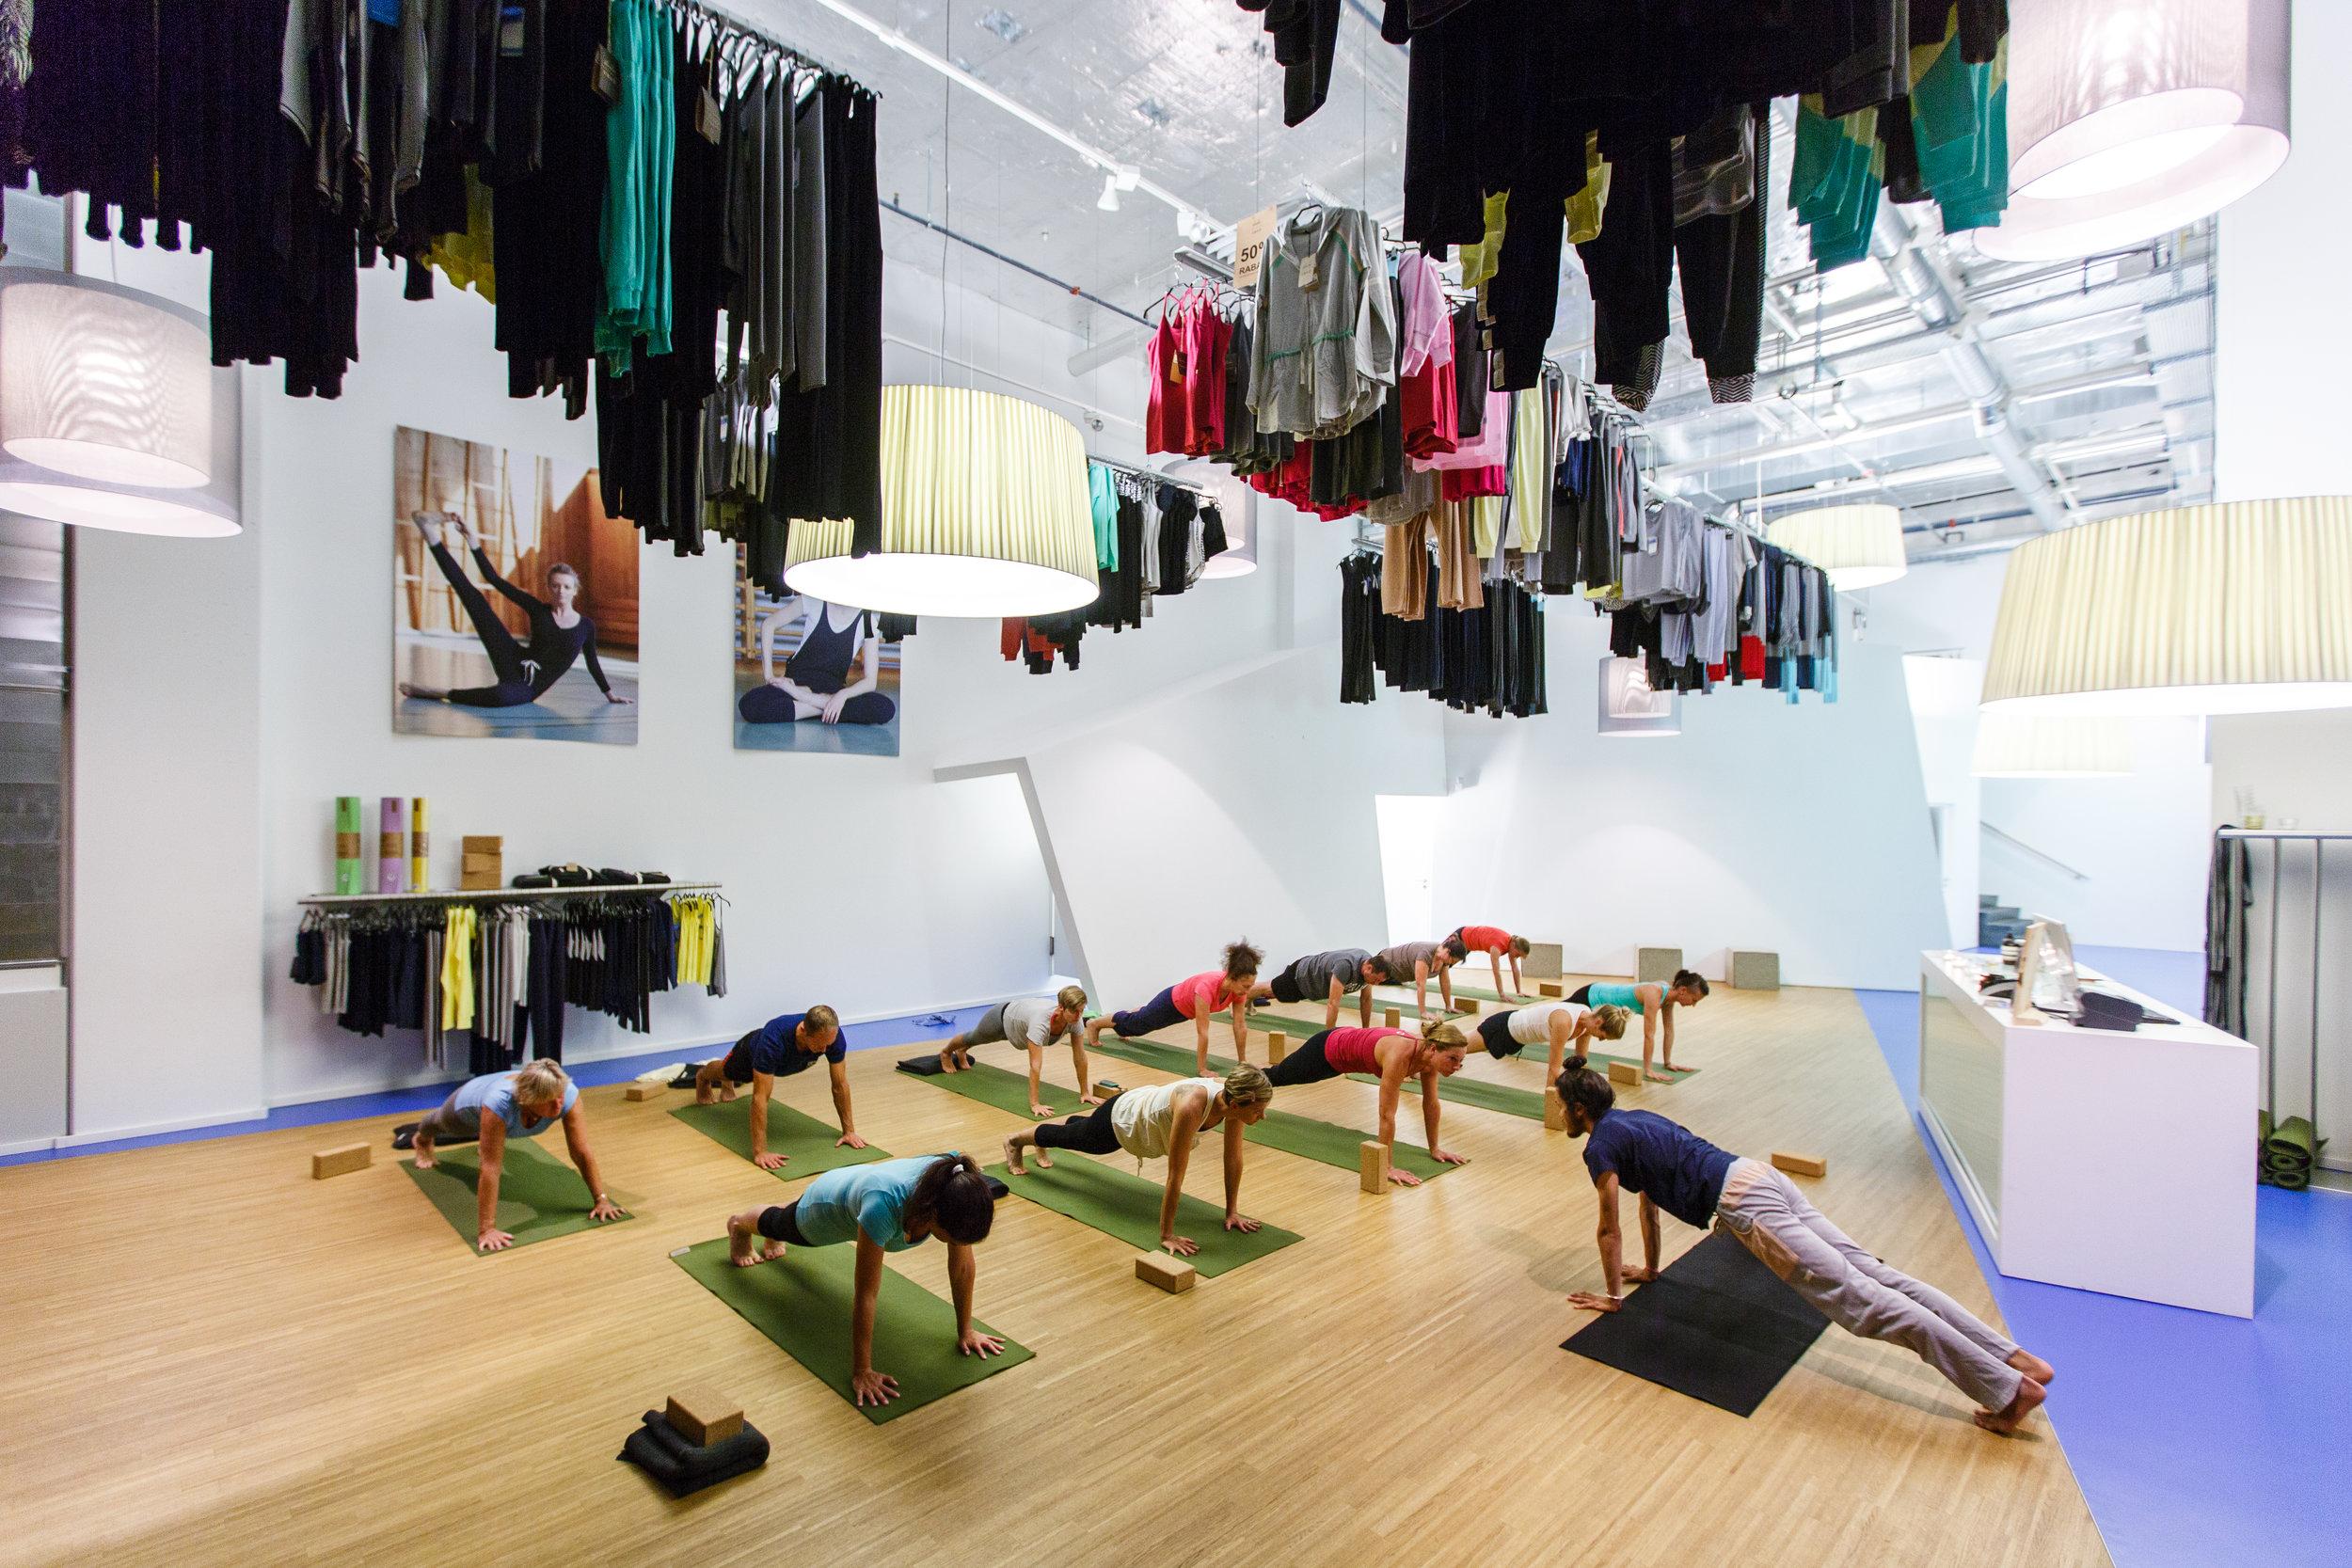 yoga david suivez lola fred1